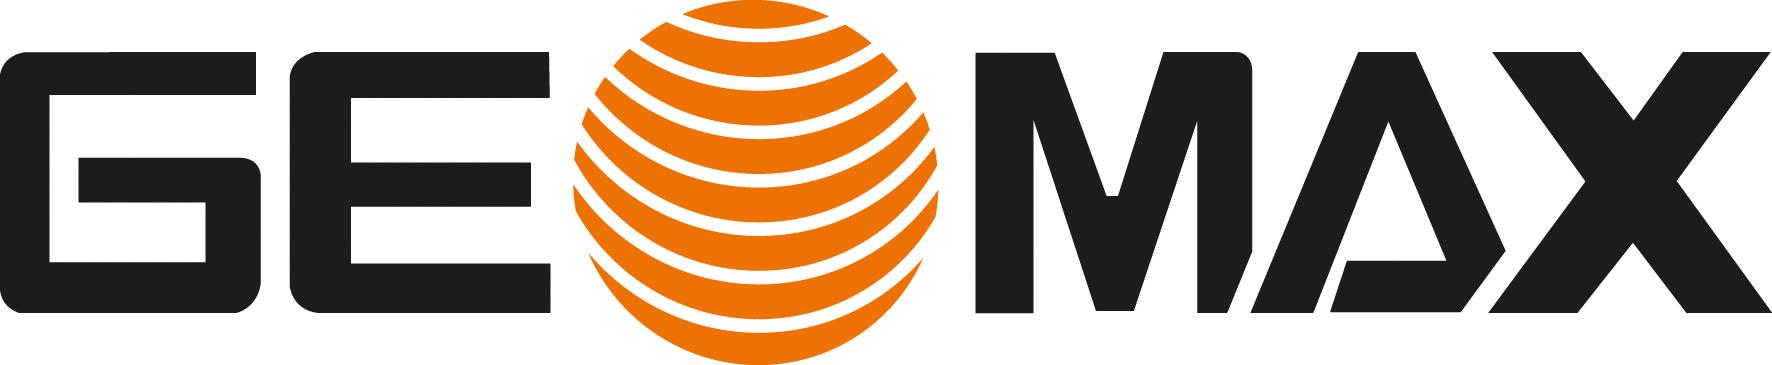 GeoMax logo